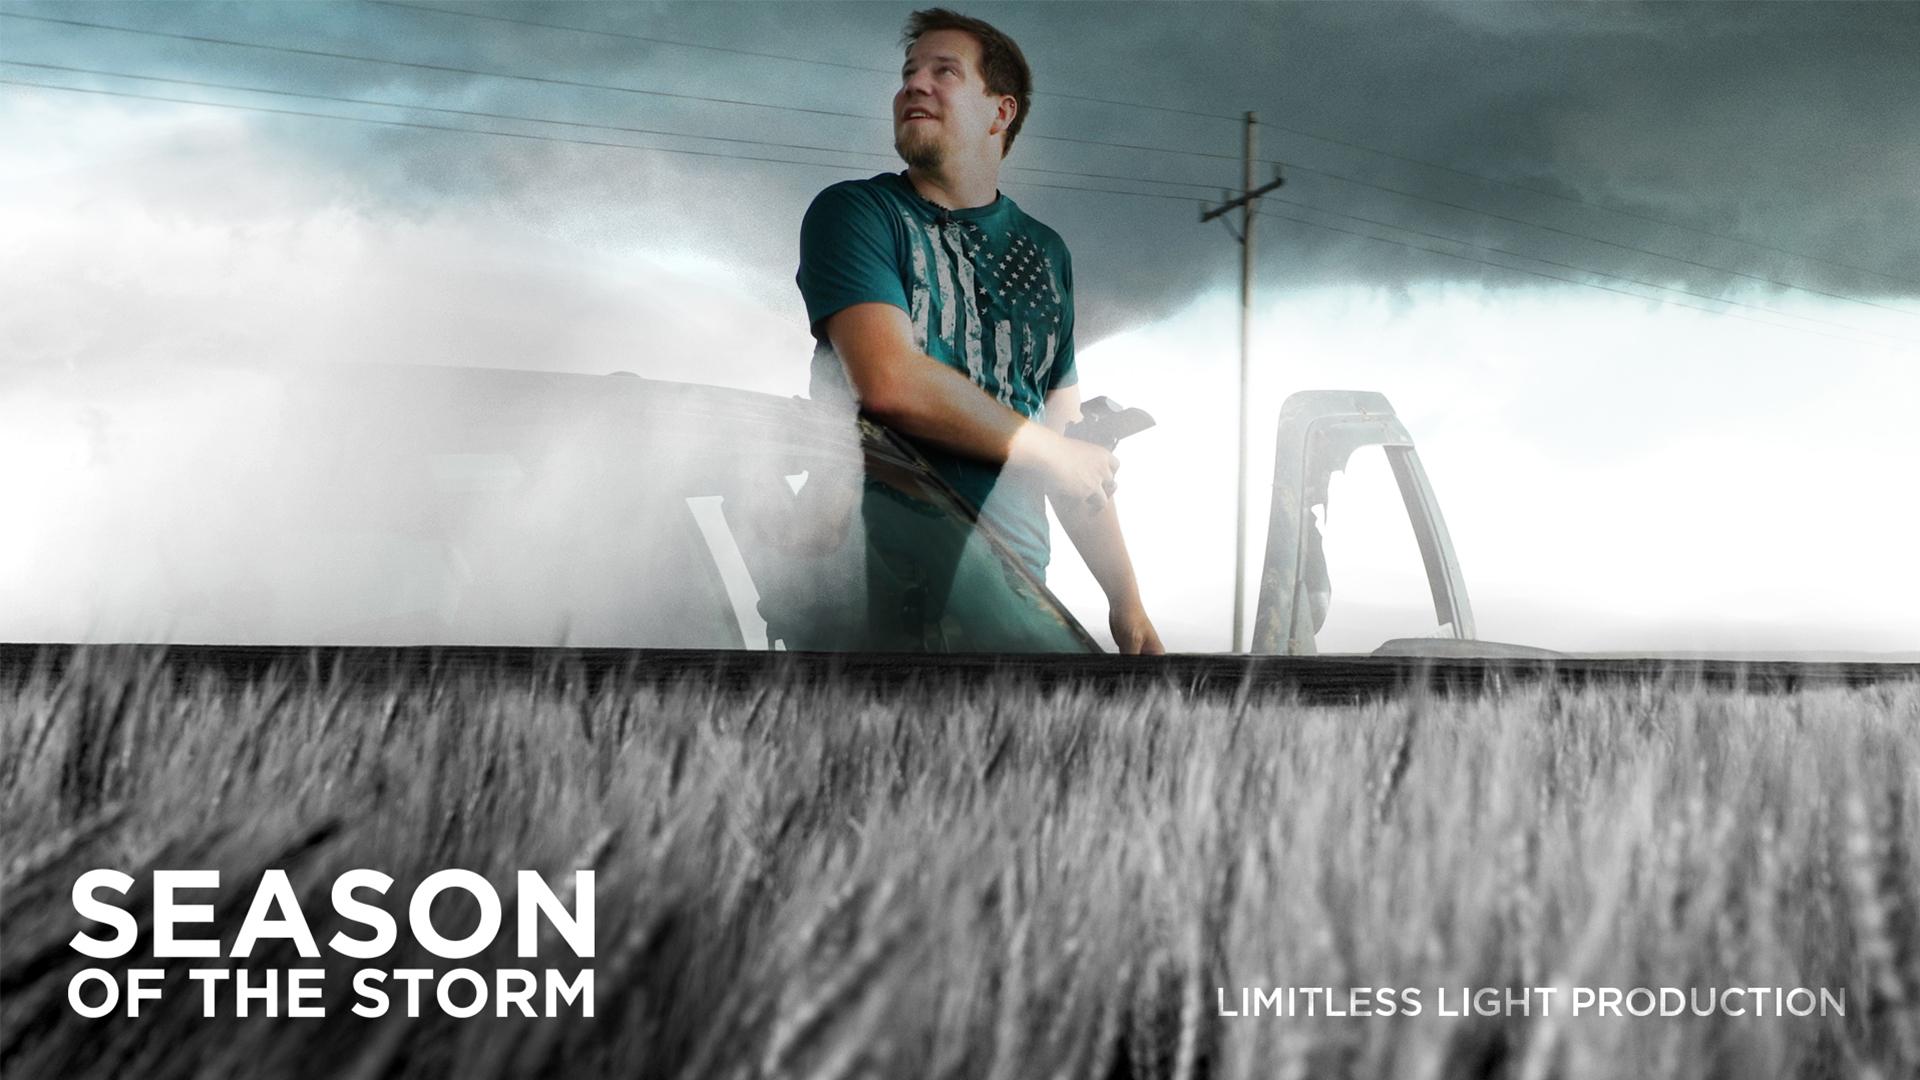 Season of the Storm